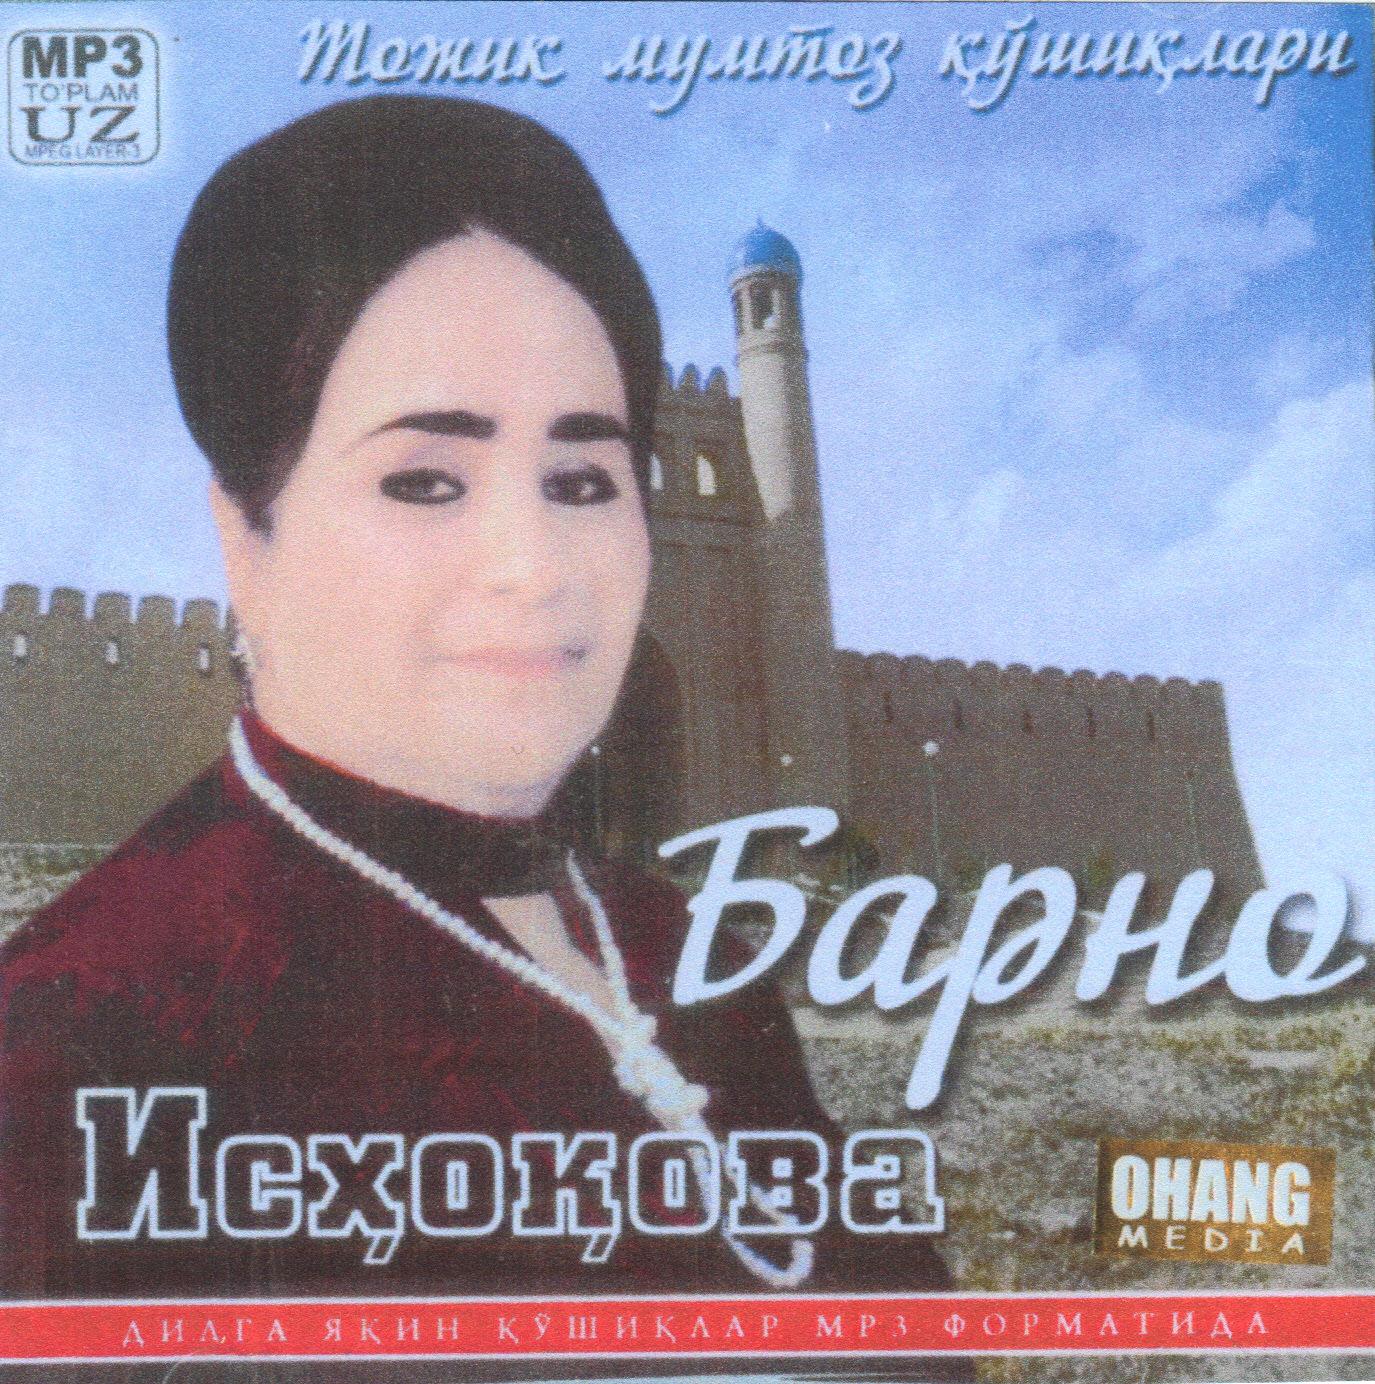 cheikh el ghafour mp3